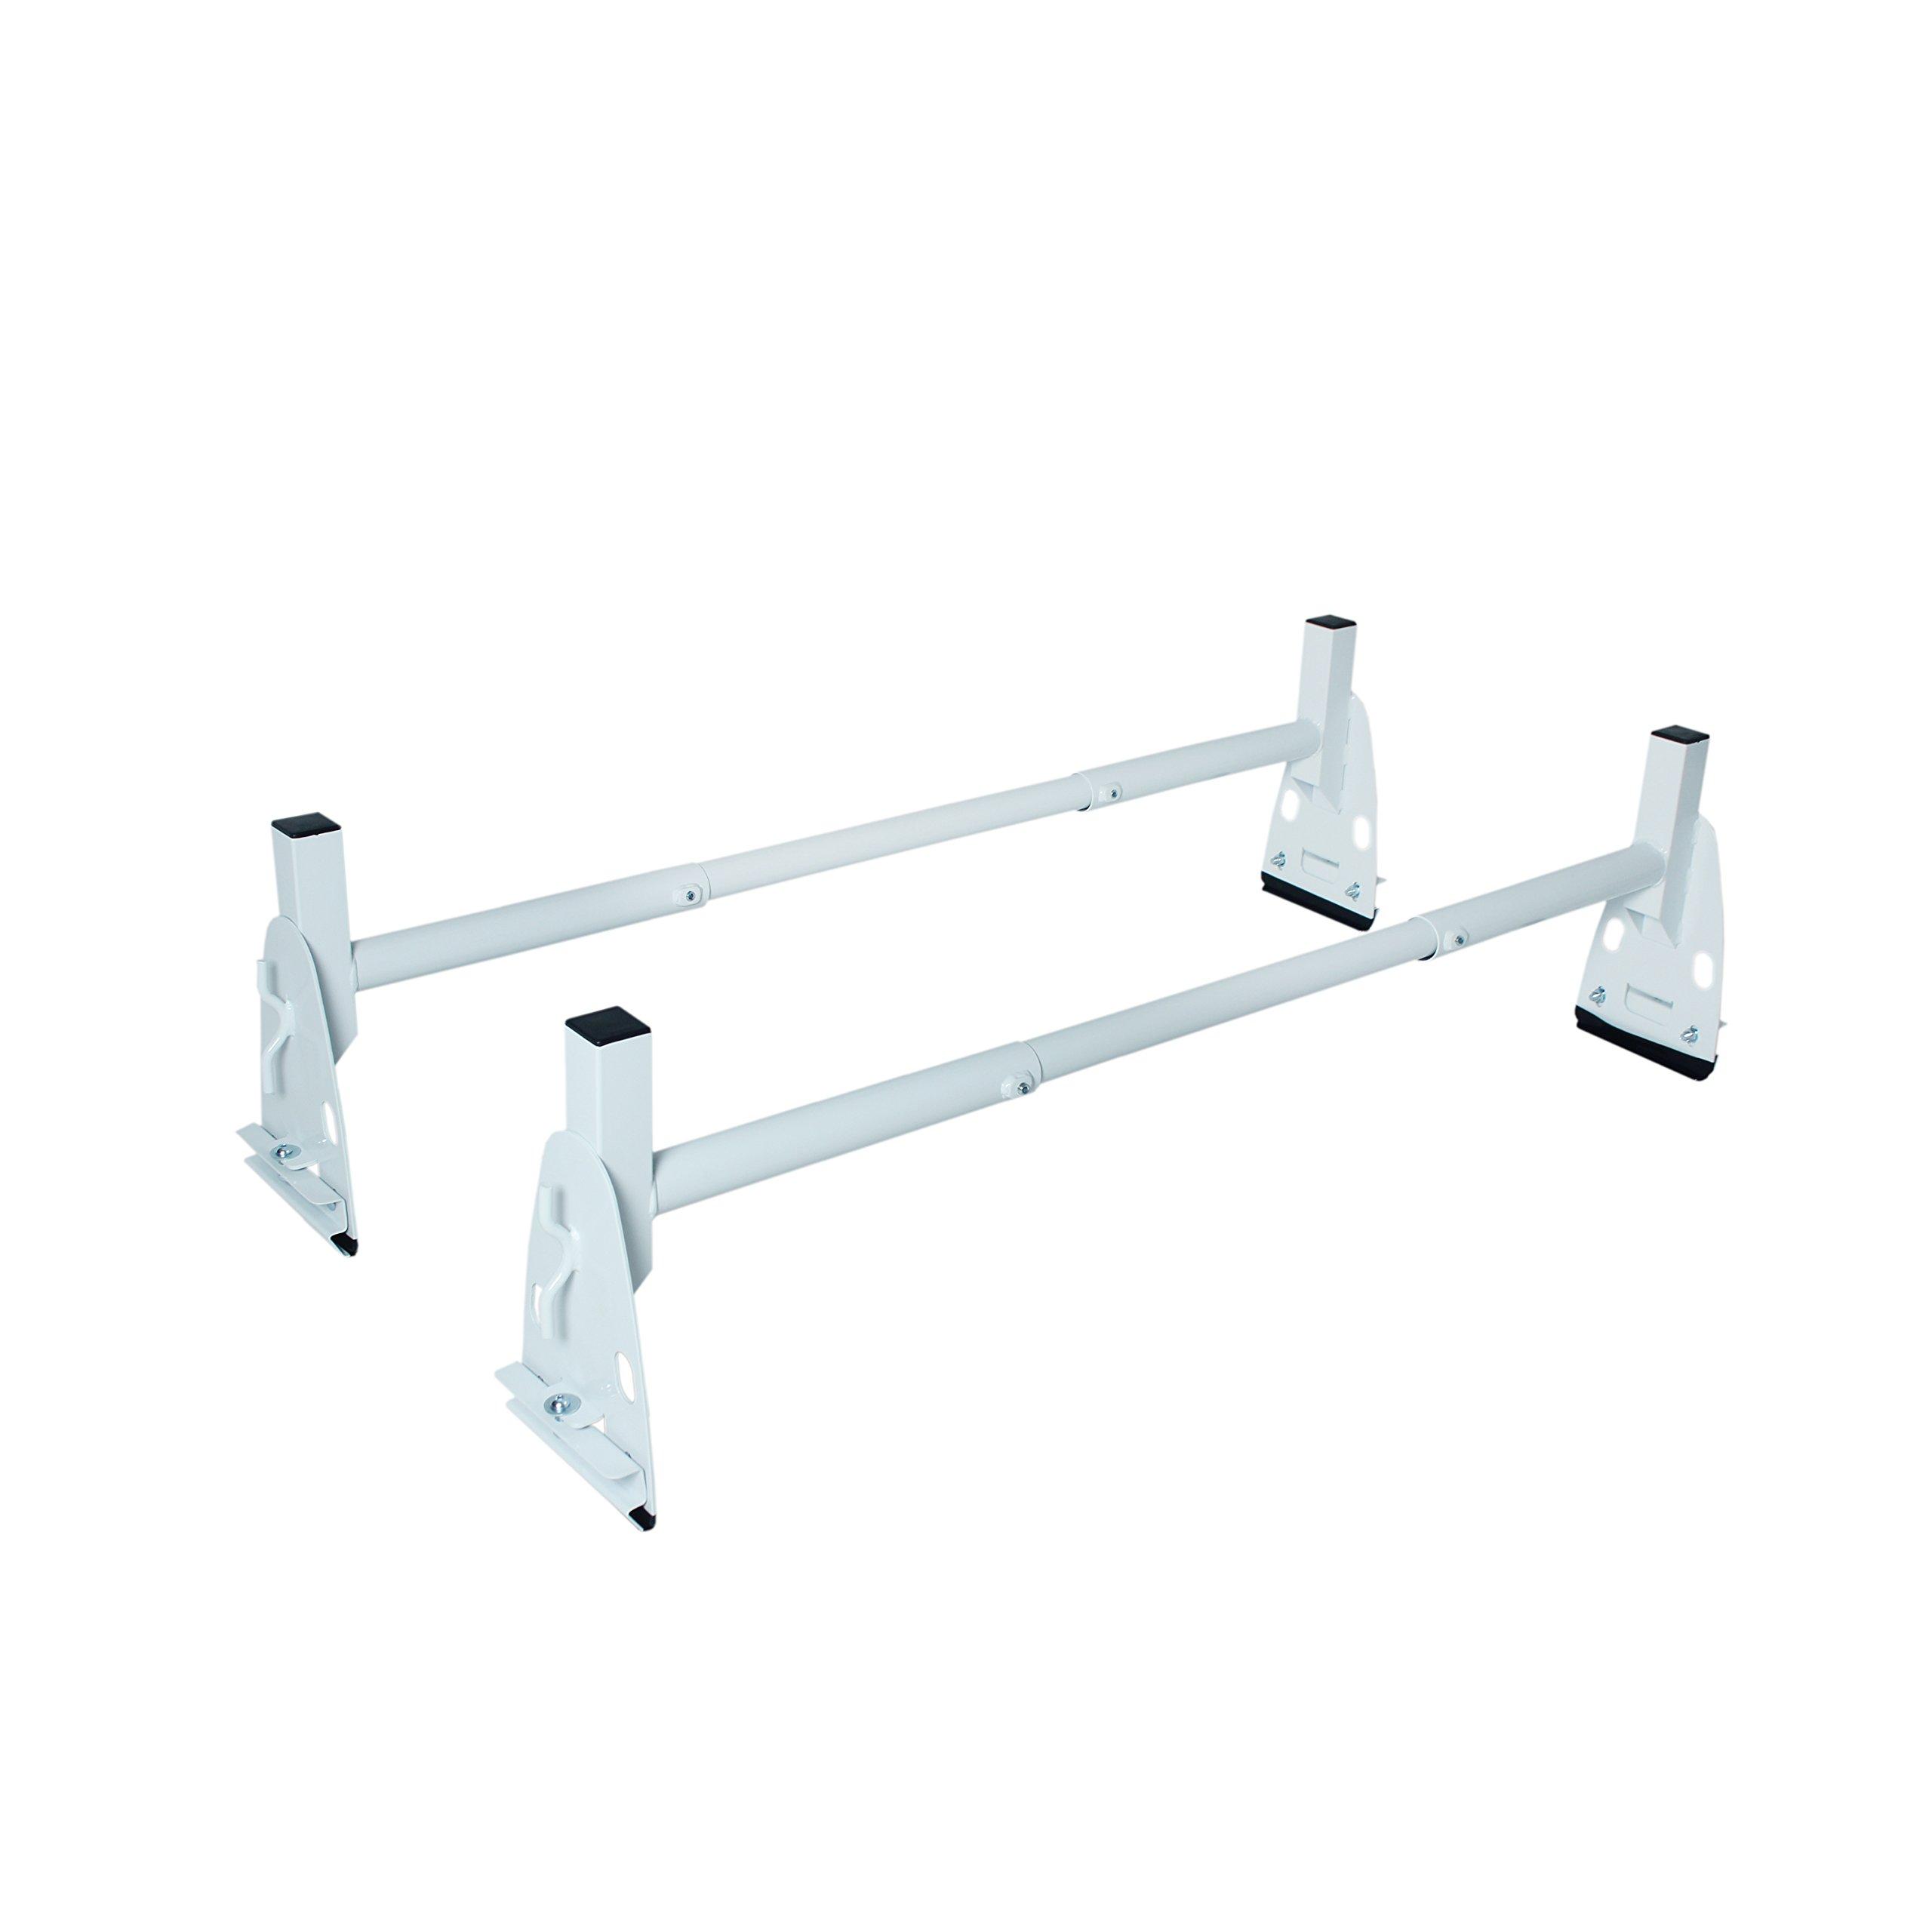 AA-Racks Model X317 HighTop 2 bar ladder roof rack Heavy Duty Rain-Gutter Van Roof Rack Round Bar Steel